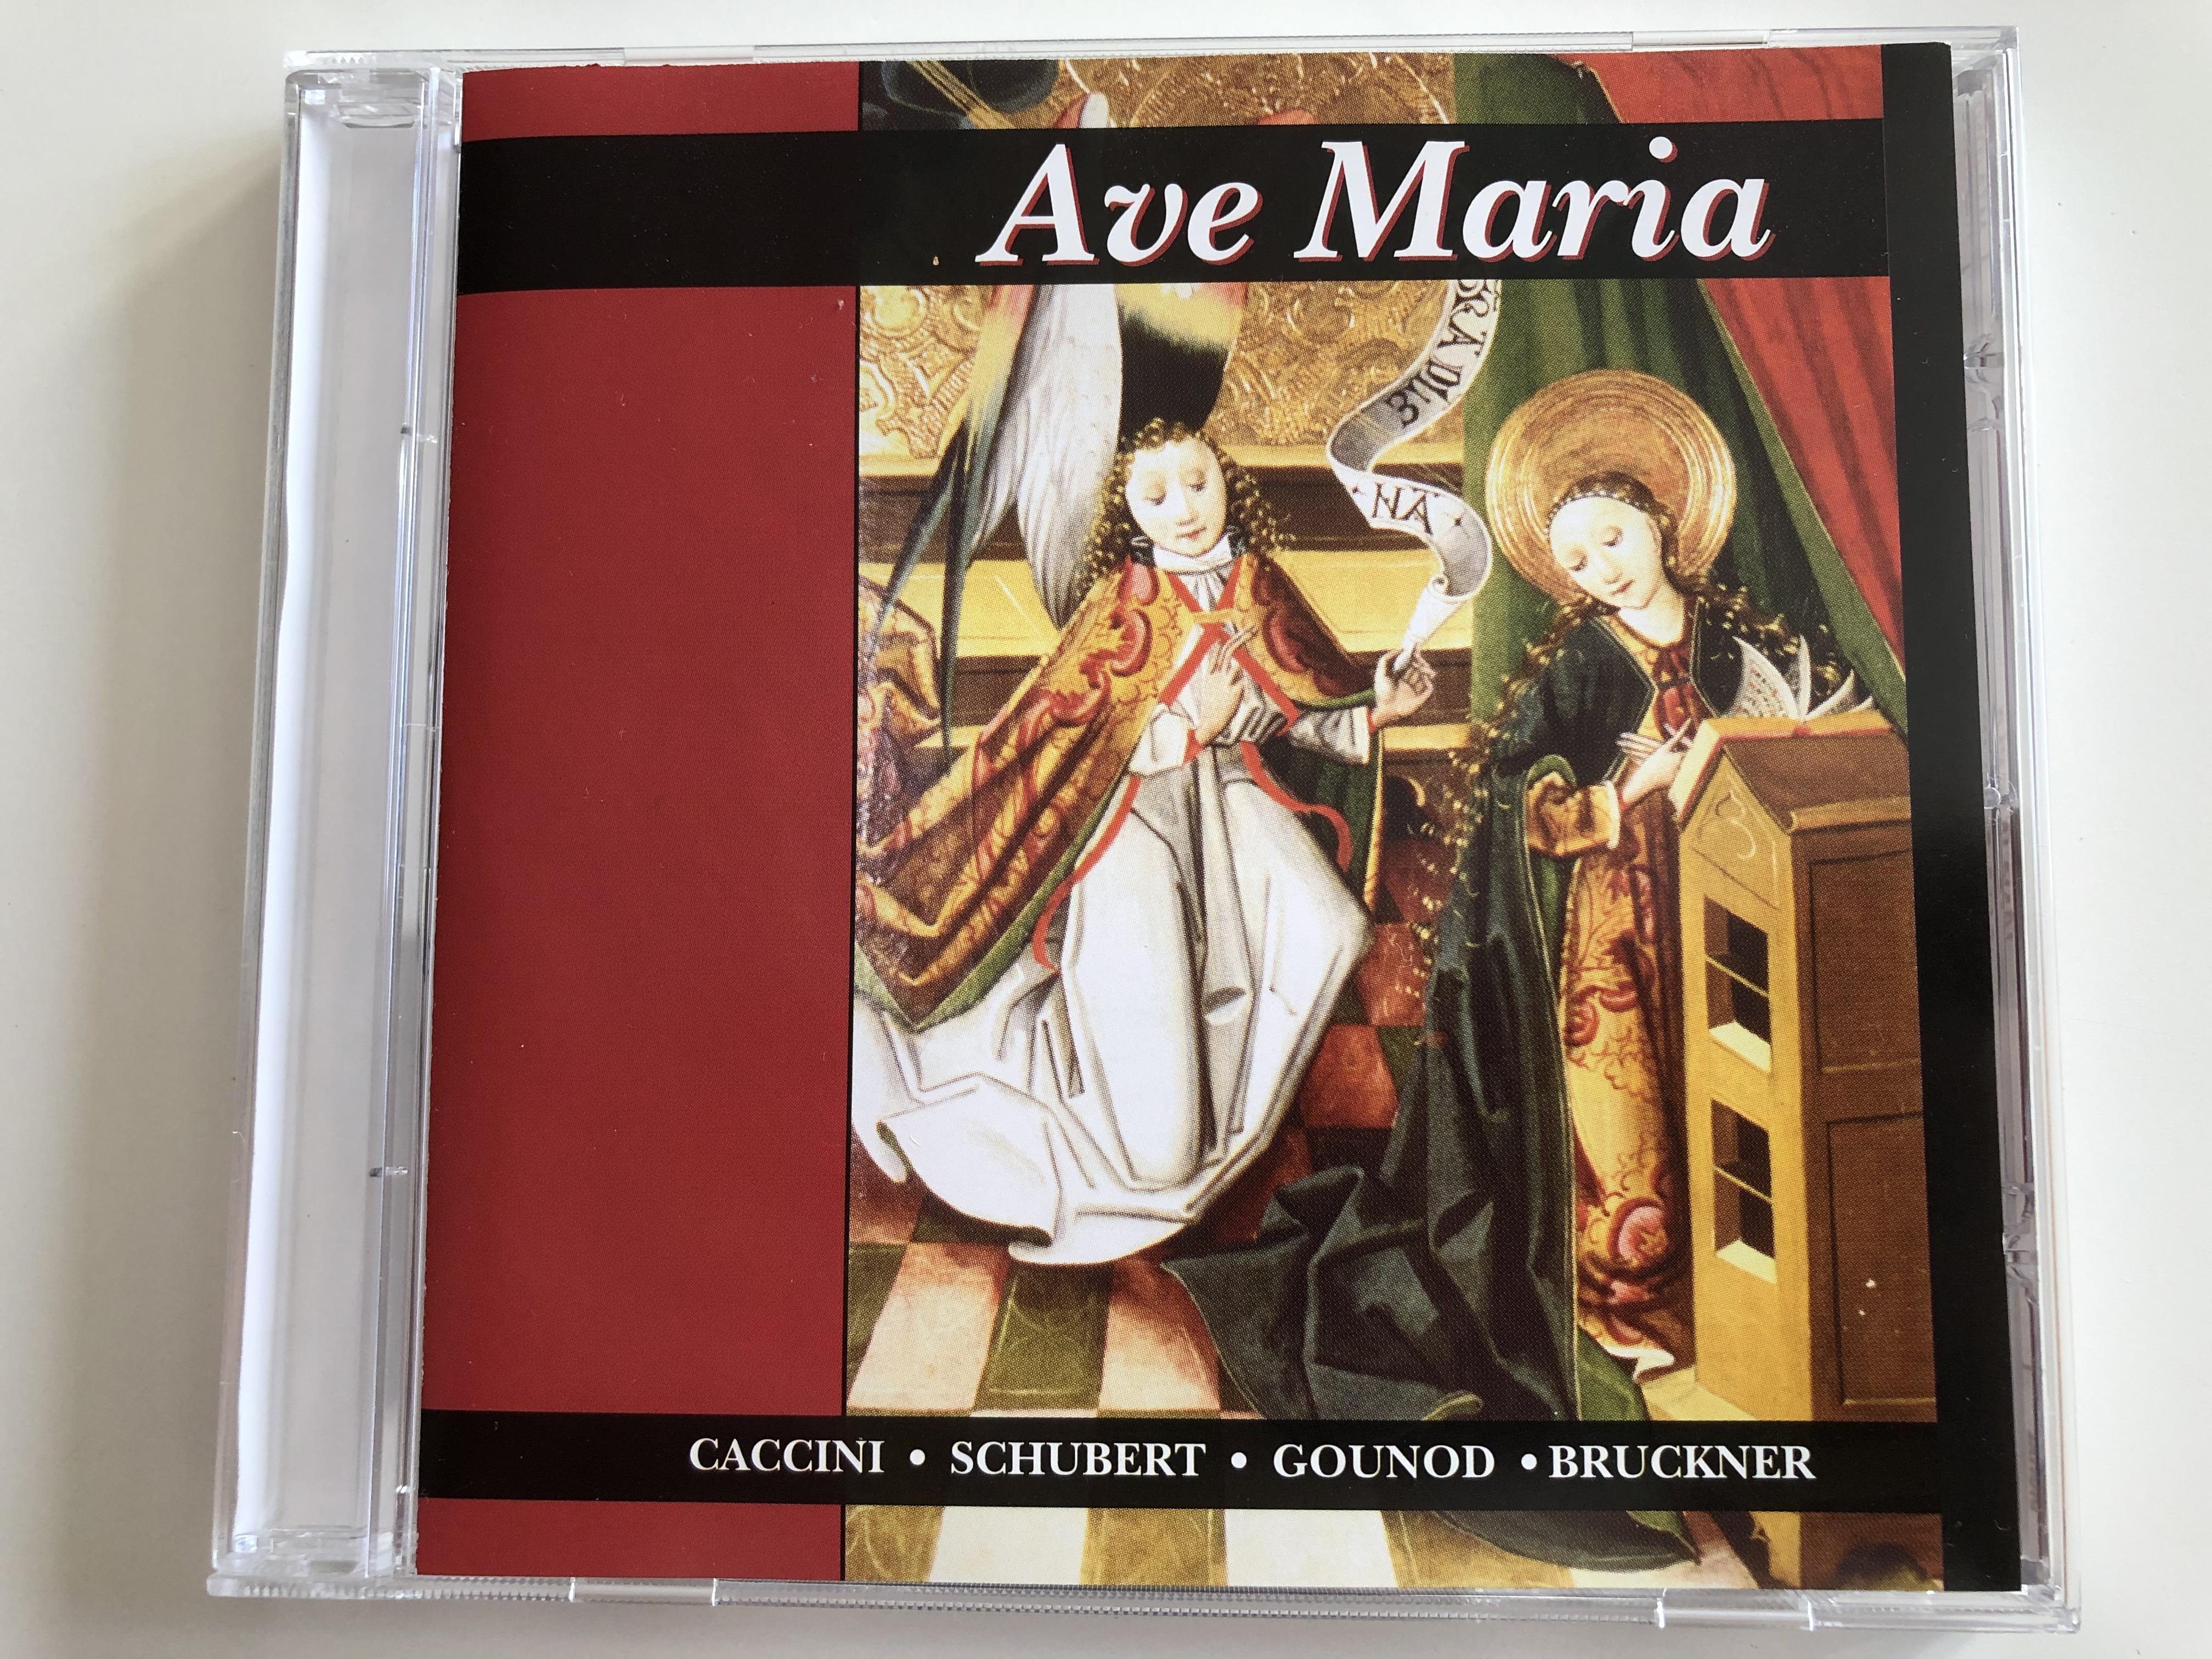 ave-maria-caccini-schubert-gounod-bruckner-allegro-thaler-audio-cd-2000-mza-05-1-.jpg